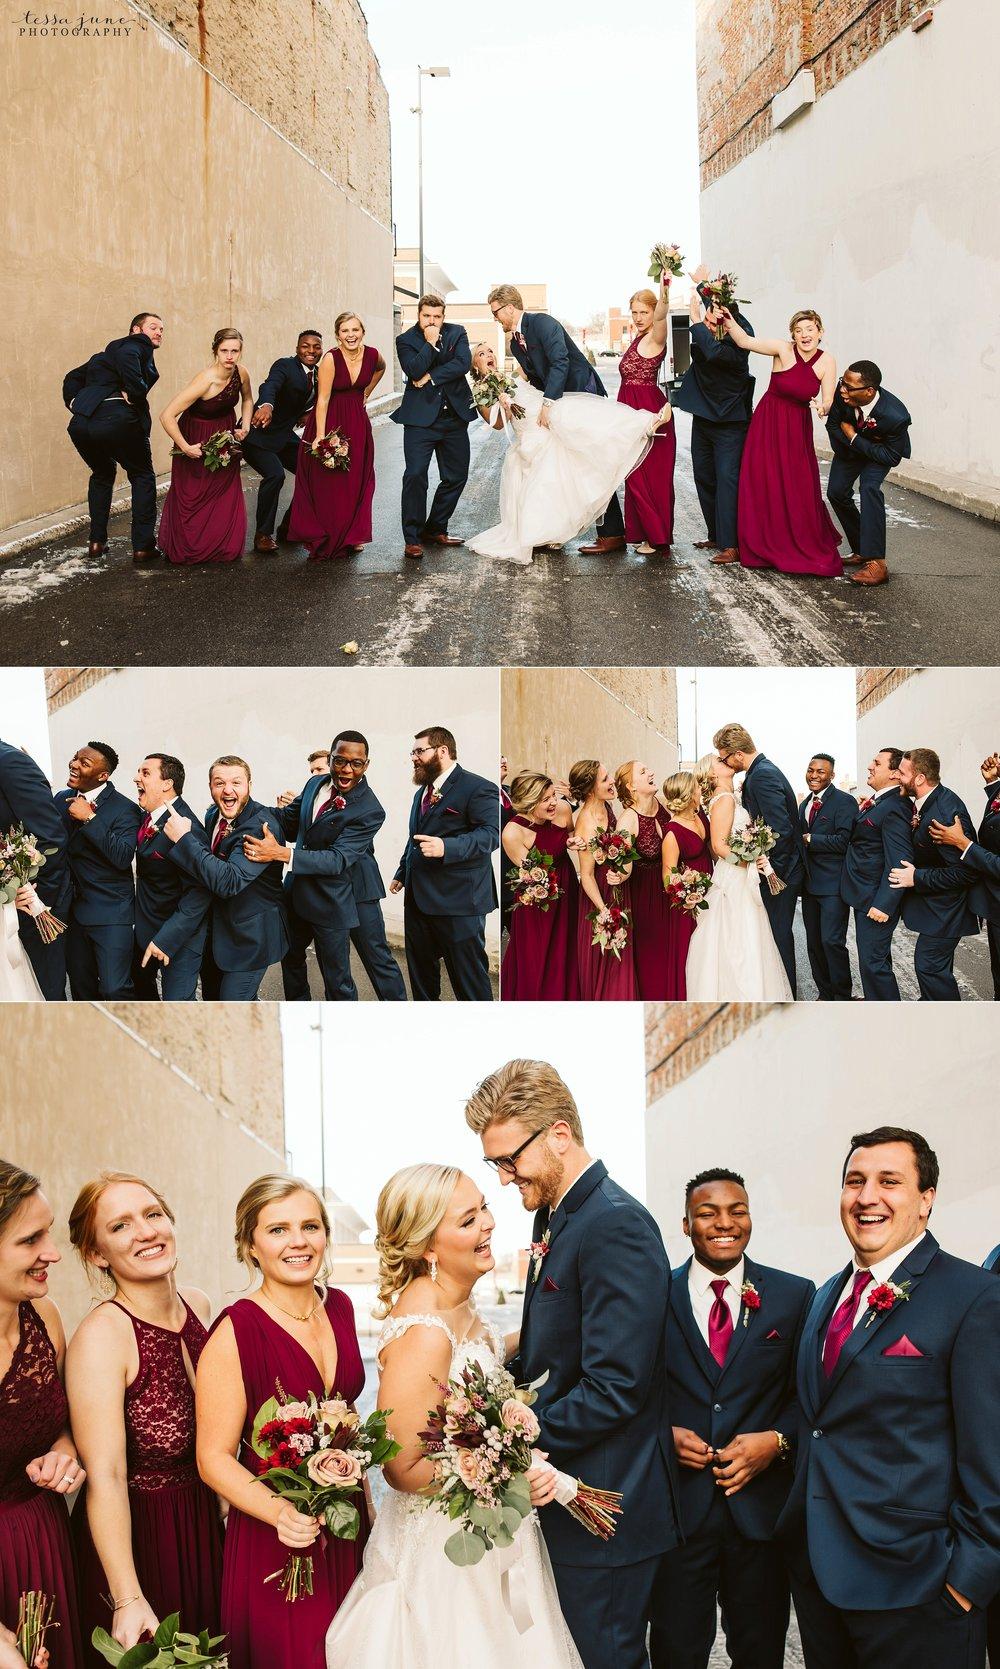 the-3-ten-event-venue-november-elegant-cozy-wedding-faribault-minnesota-91.jpg